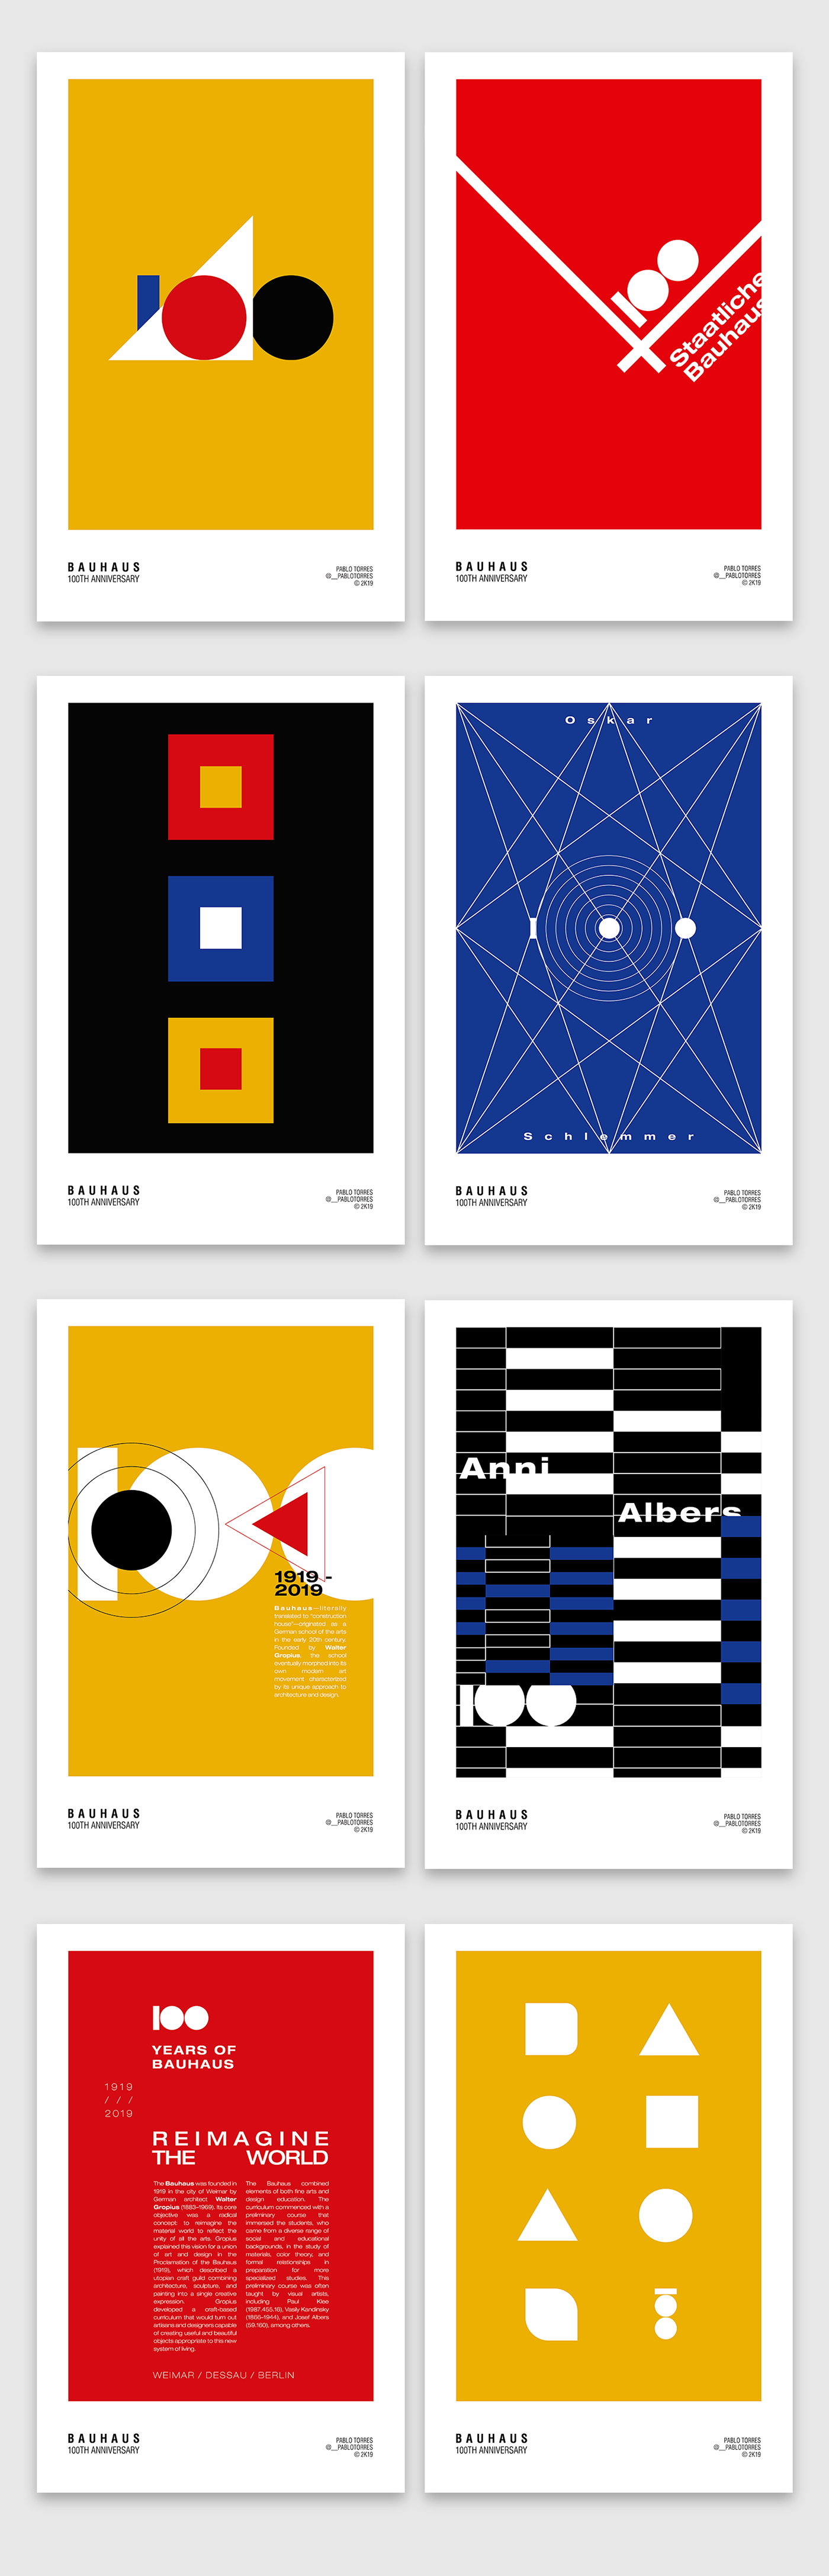 bauhaus diseño gráfico graphic design  shapes animation  motion graphics  wasilly kandinsky walter gropius shape adobeawards